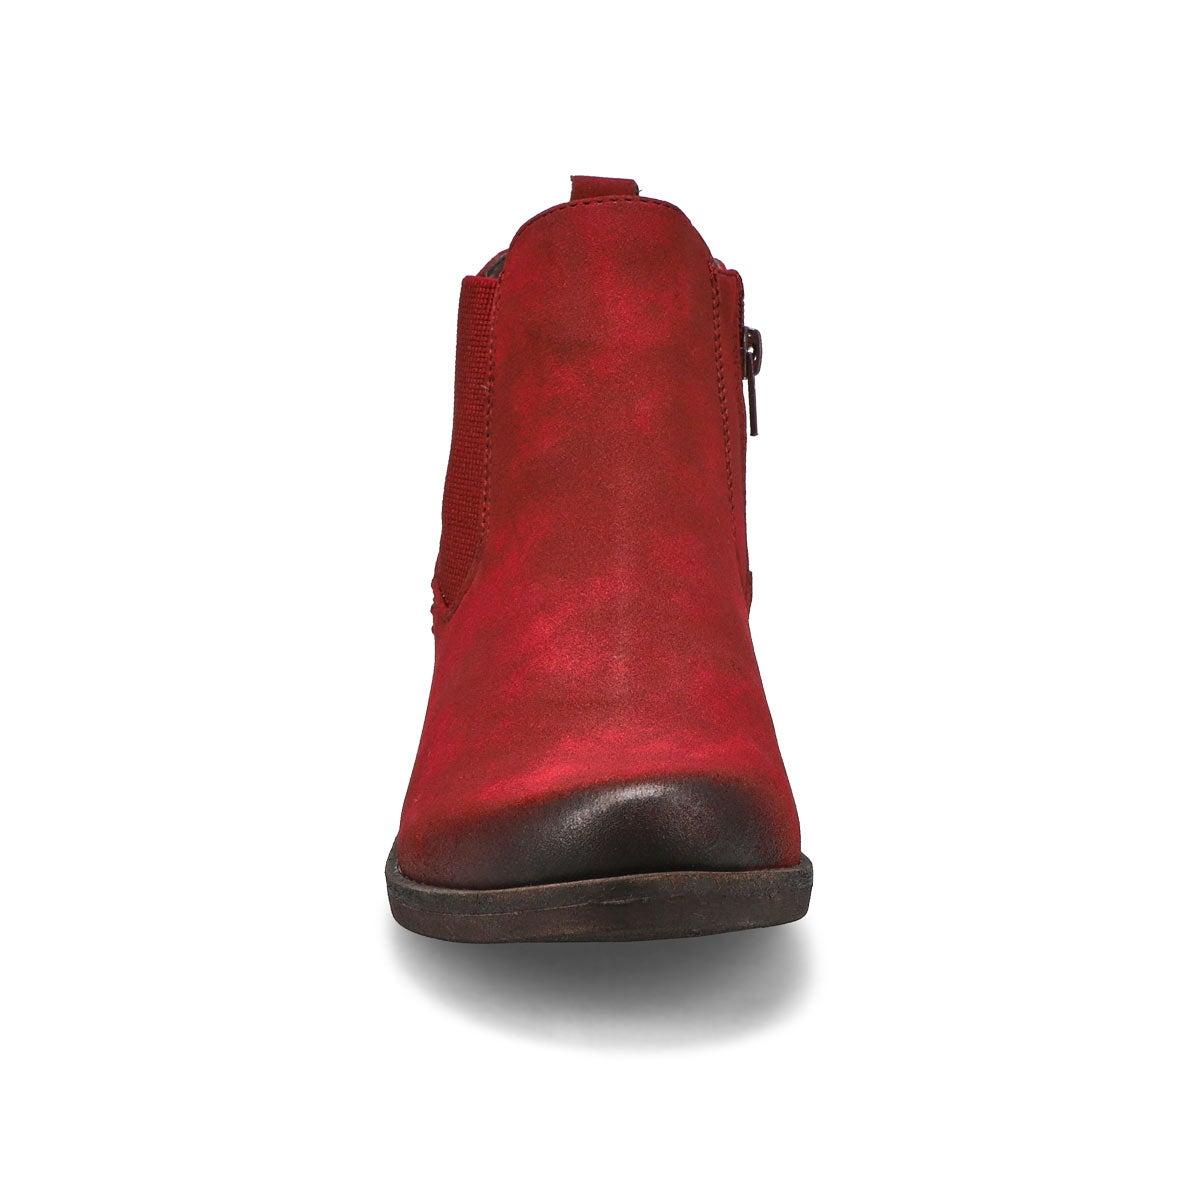 Lds Venus 37 red chelsea boot